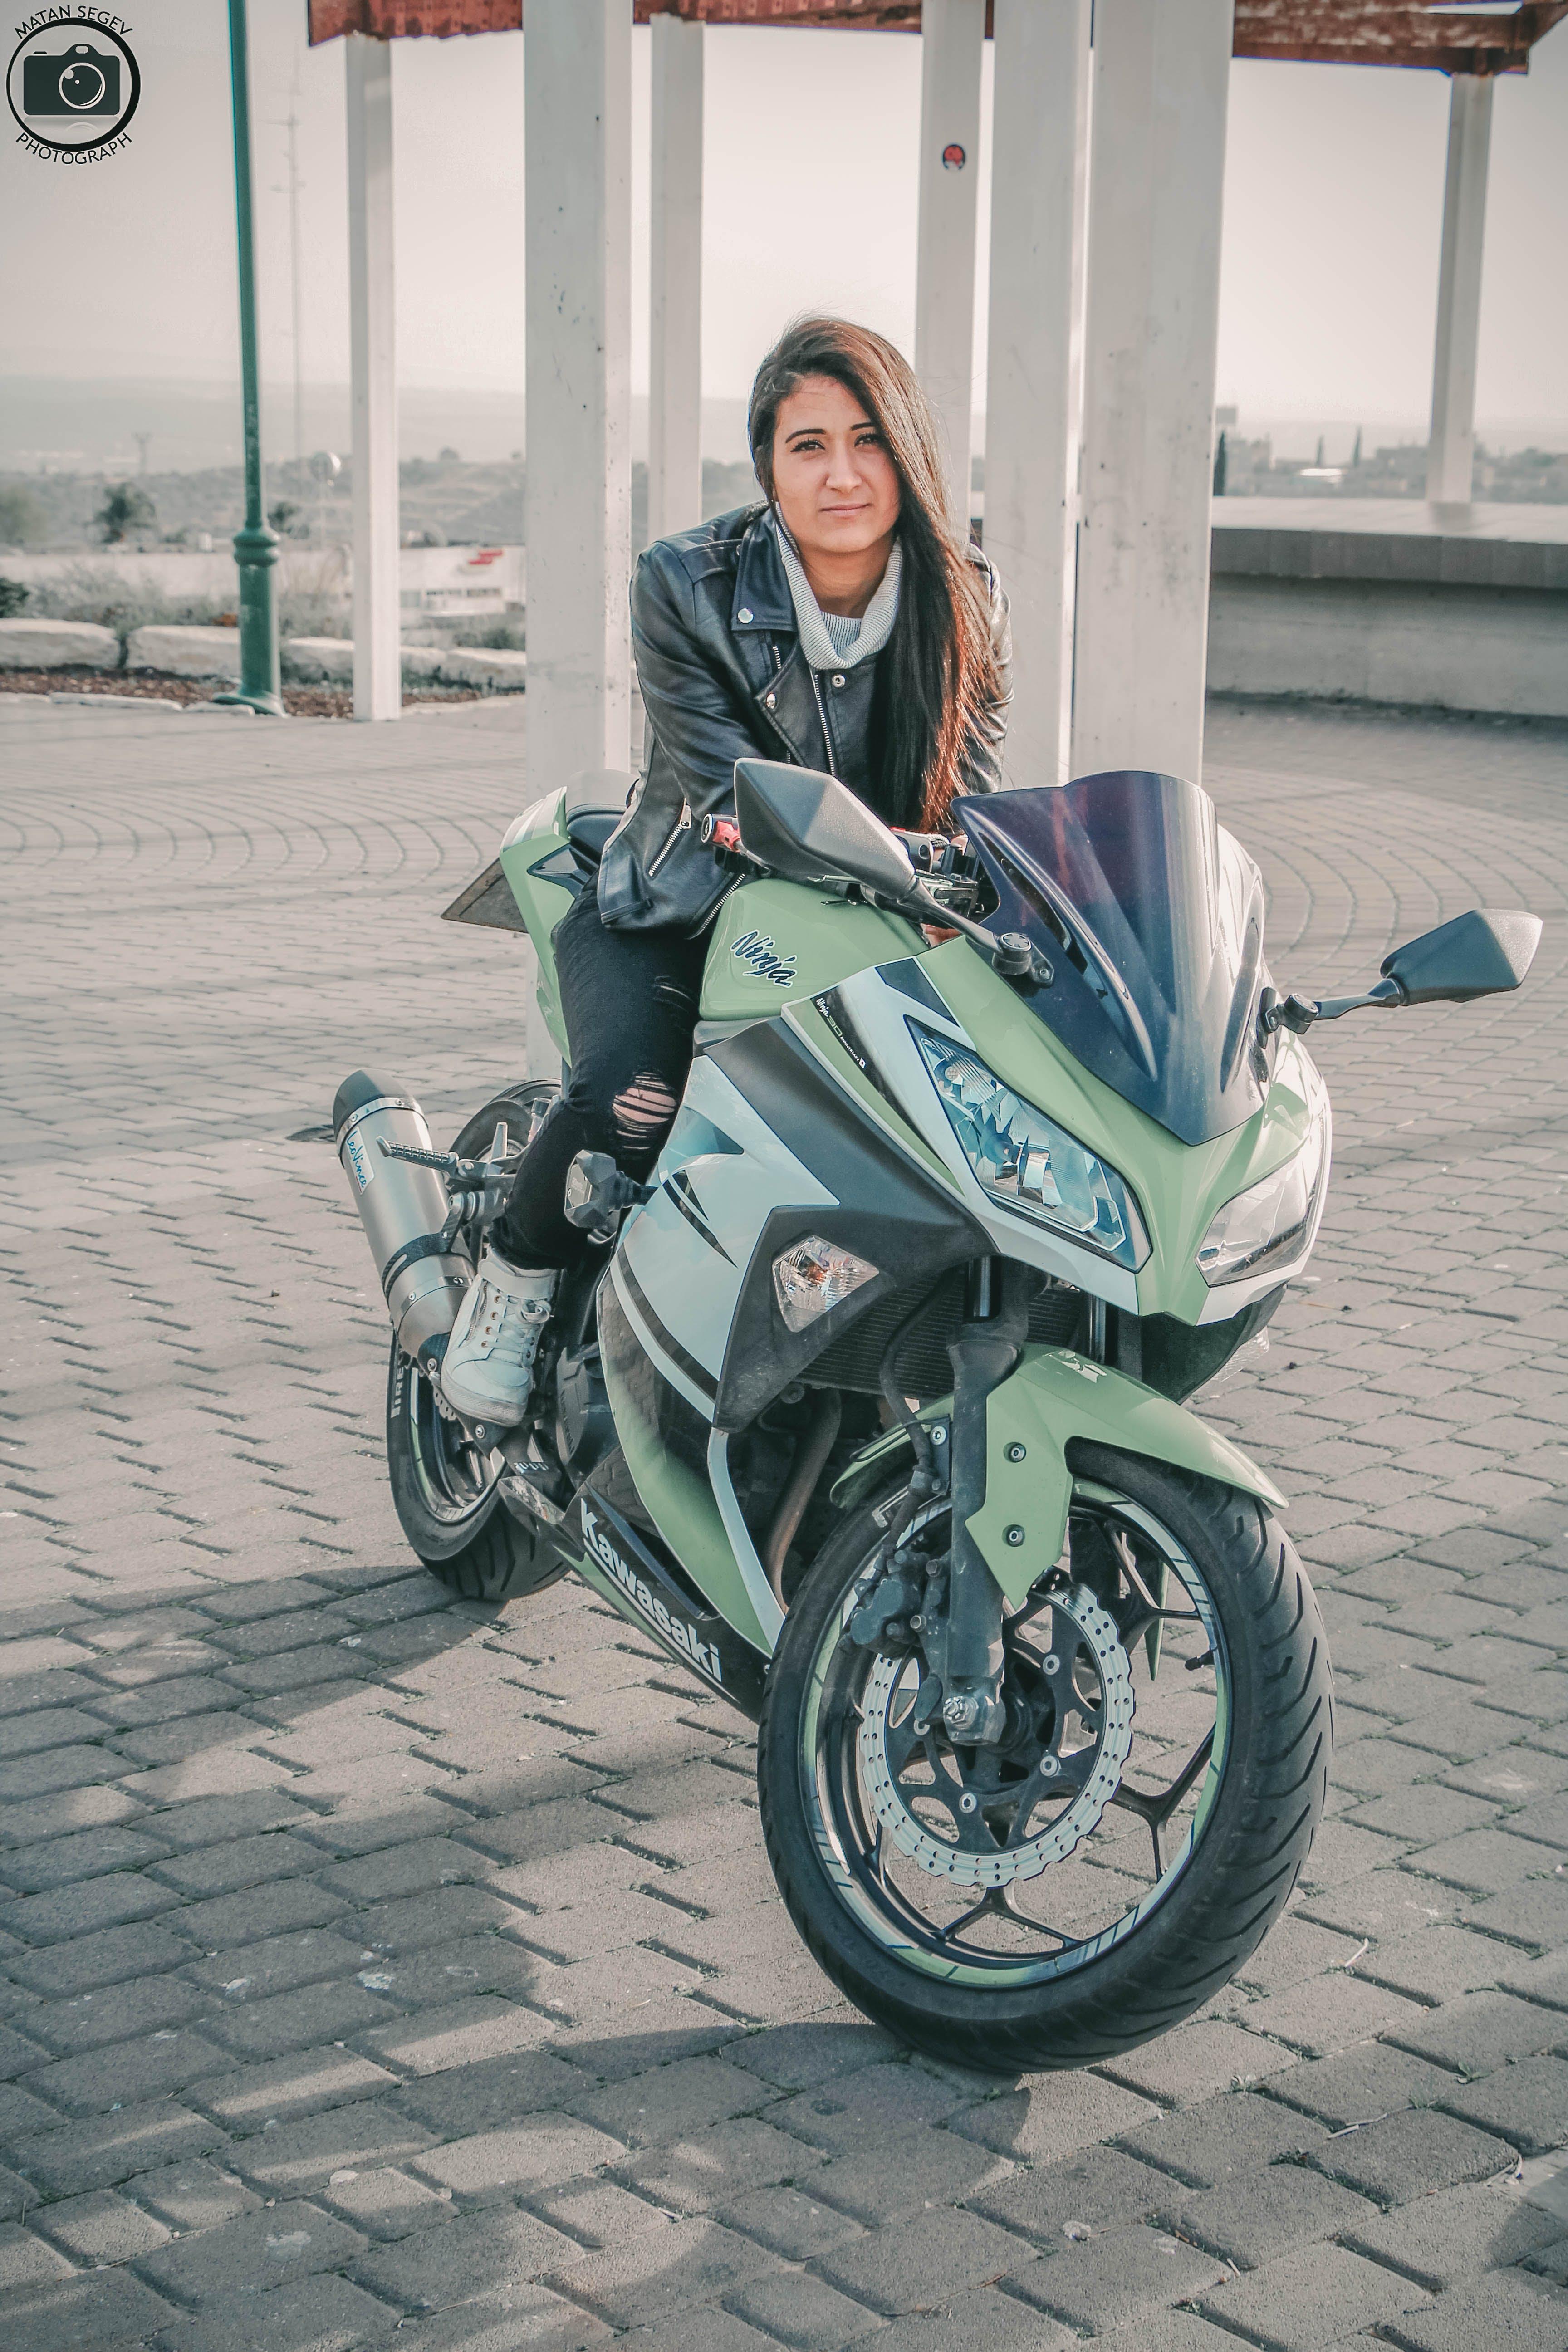 Free stock photo of girl, women, motorcycle, hair